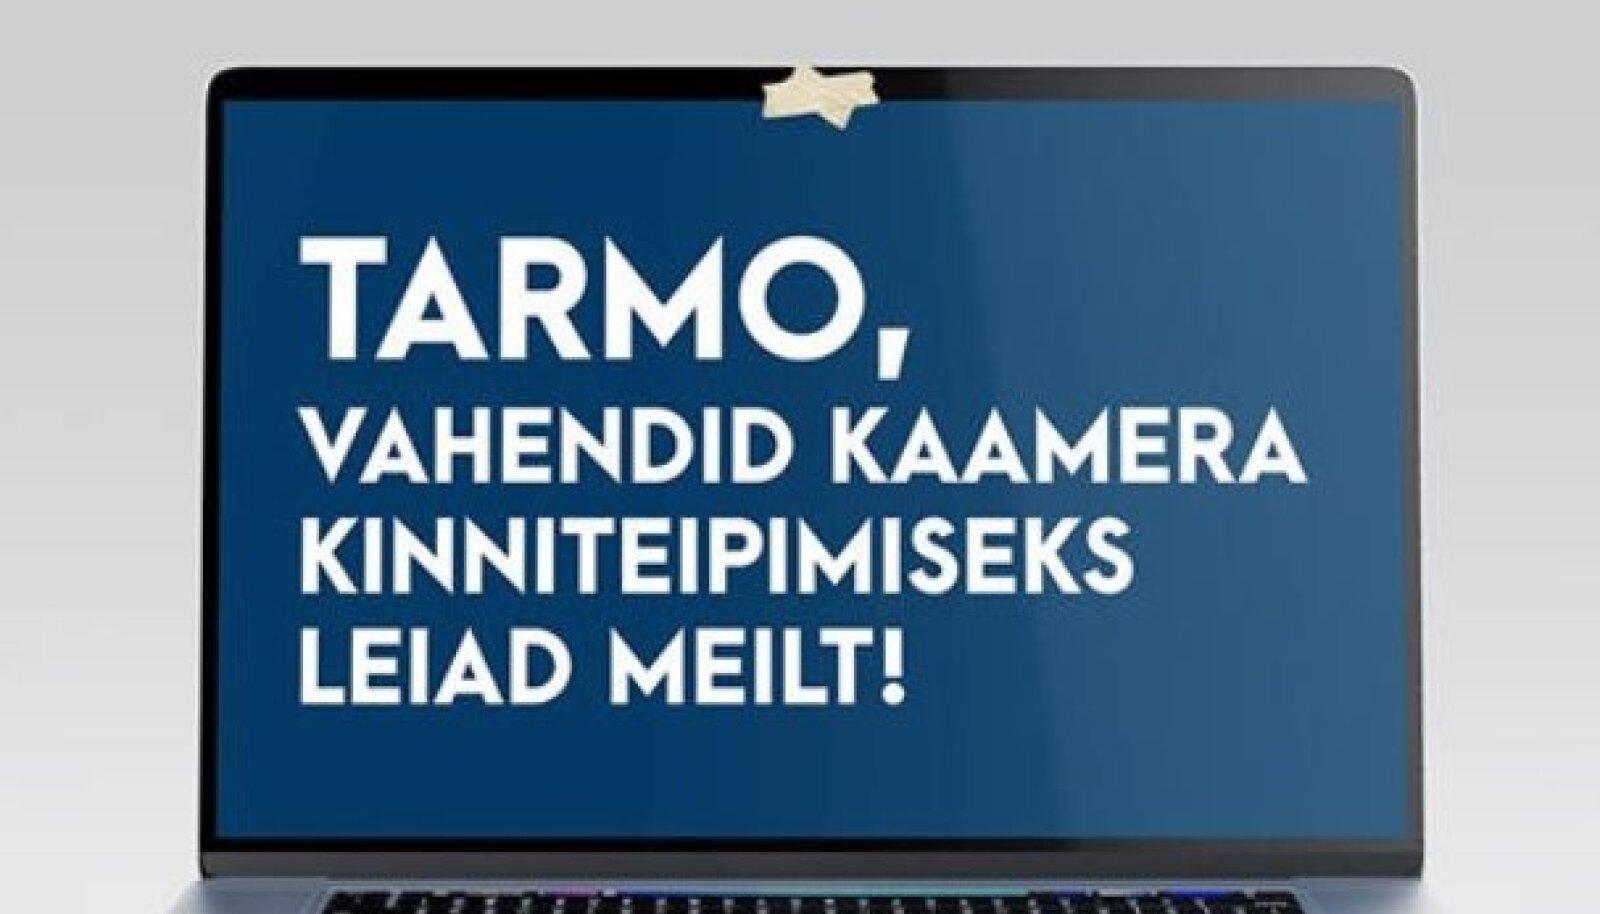 Pakendikeskuse reklaam Facebookis